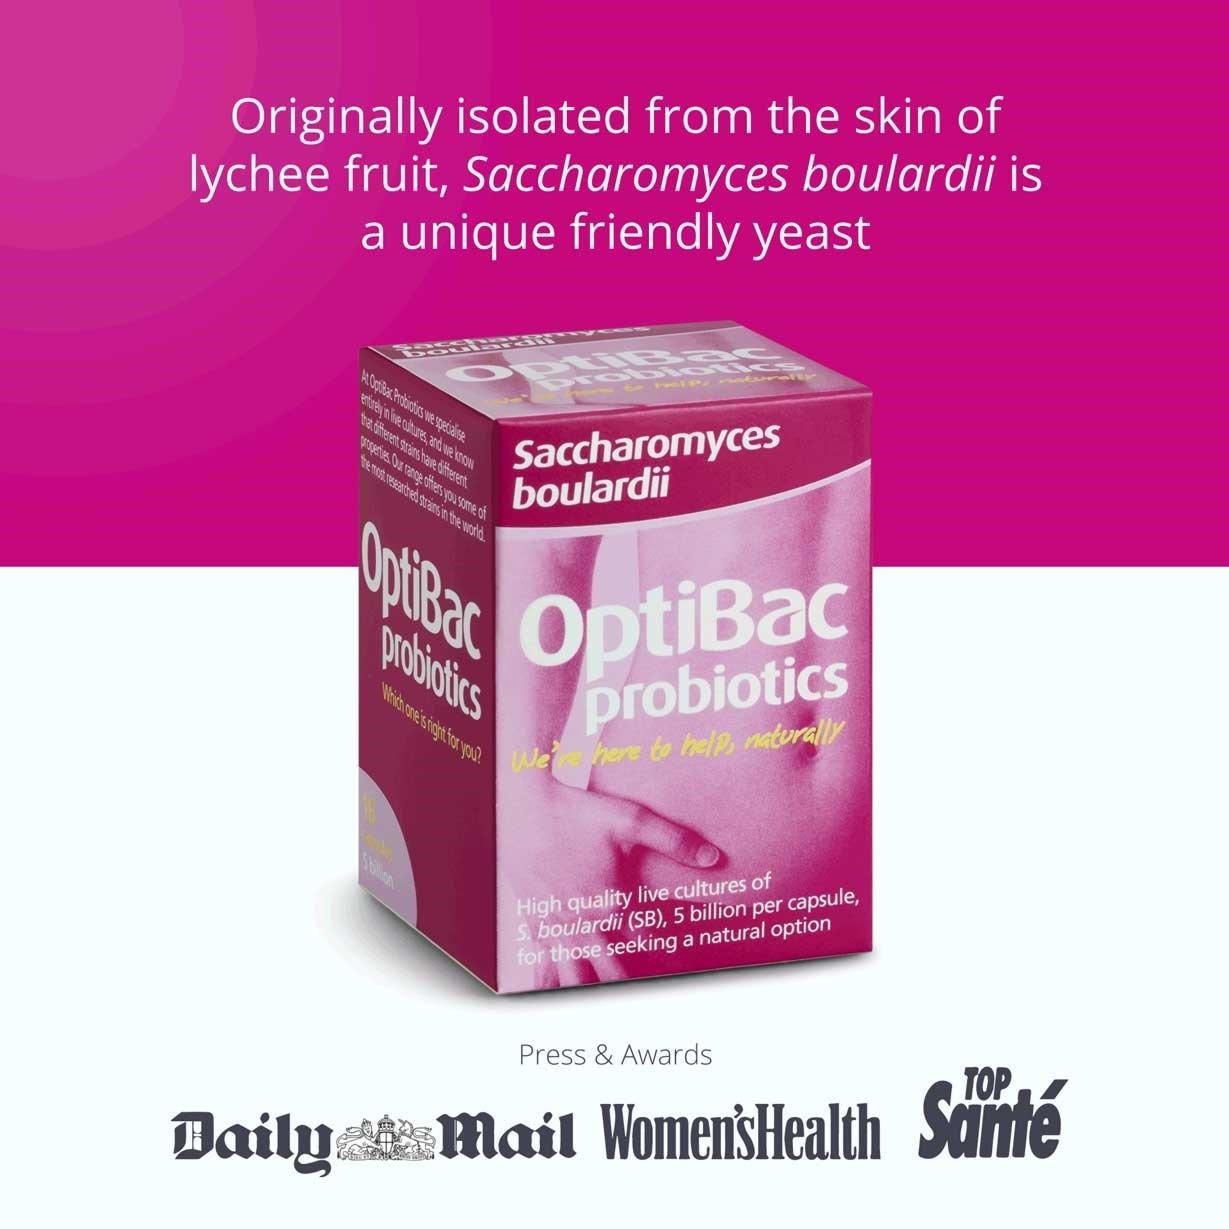 Optibac Probiotics Saccharomyces boulardii press